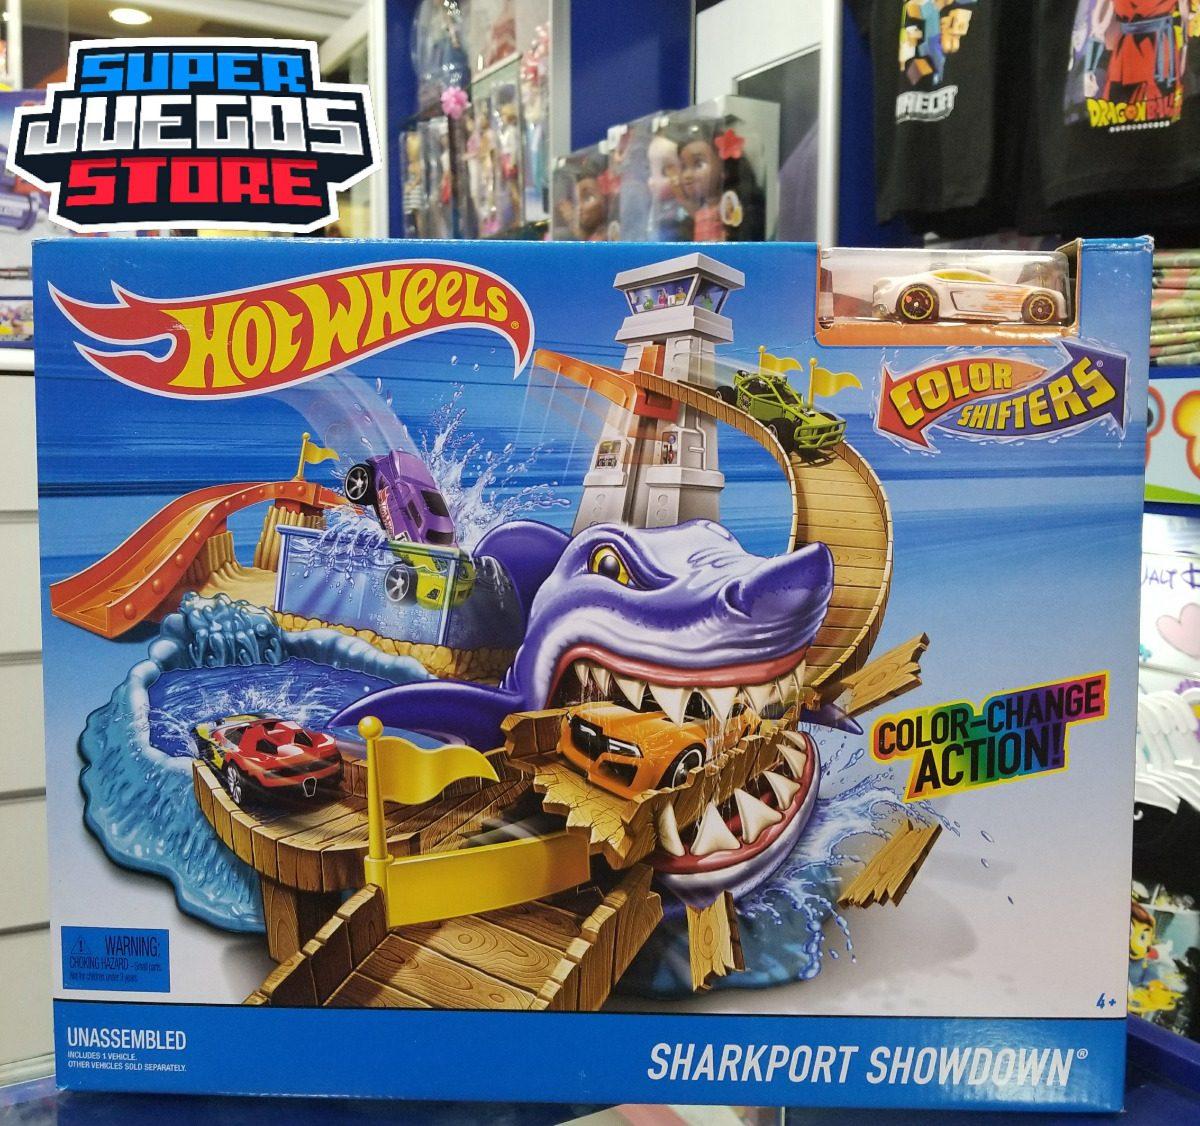 Pista Hot Wheels Sharkport Showdown Super Juegos Store Bs 75 00